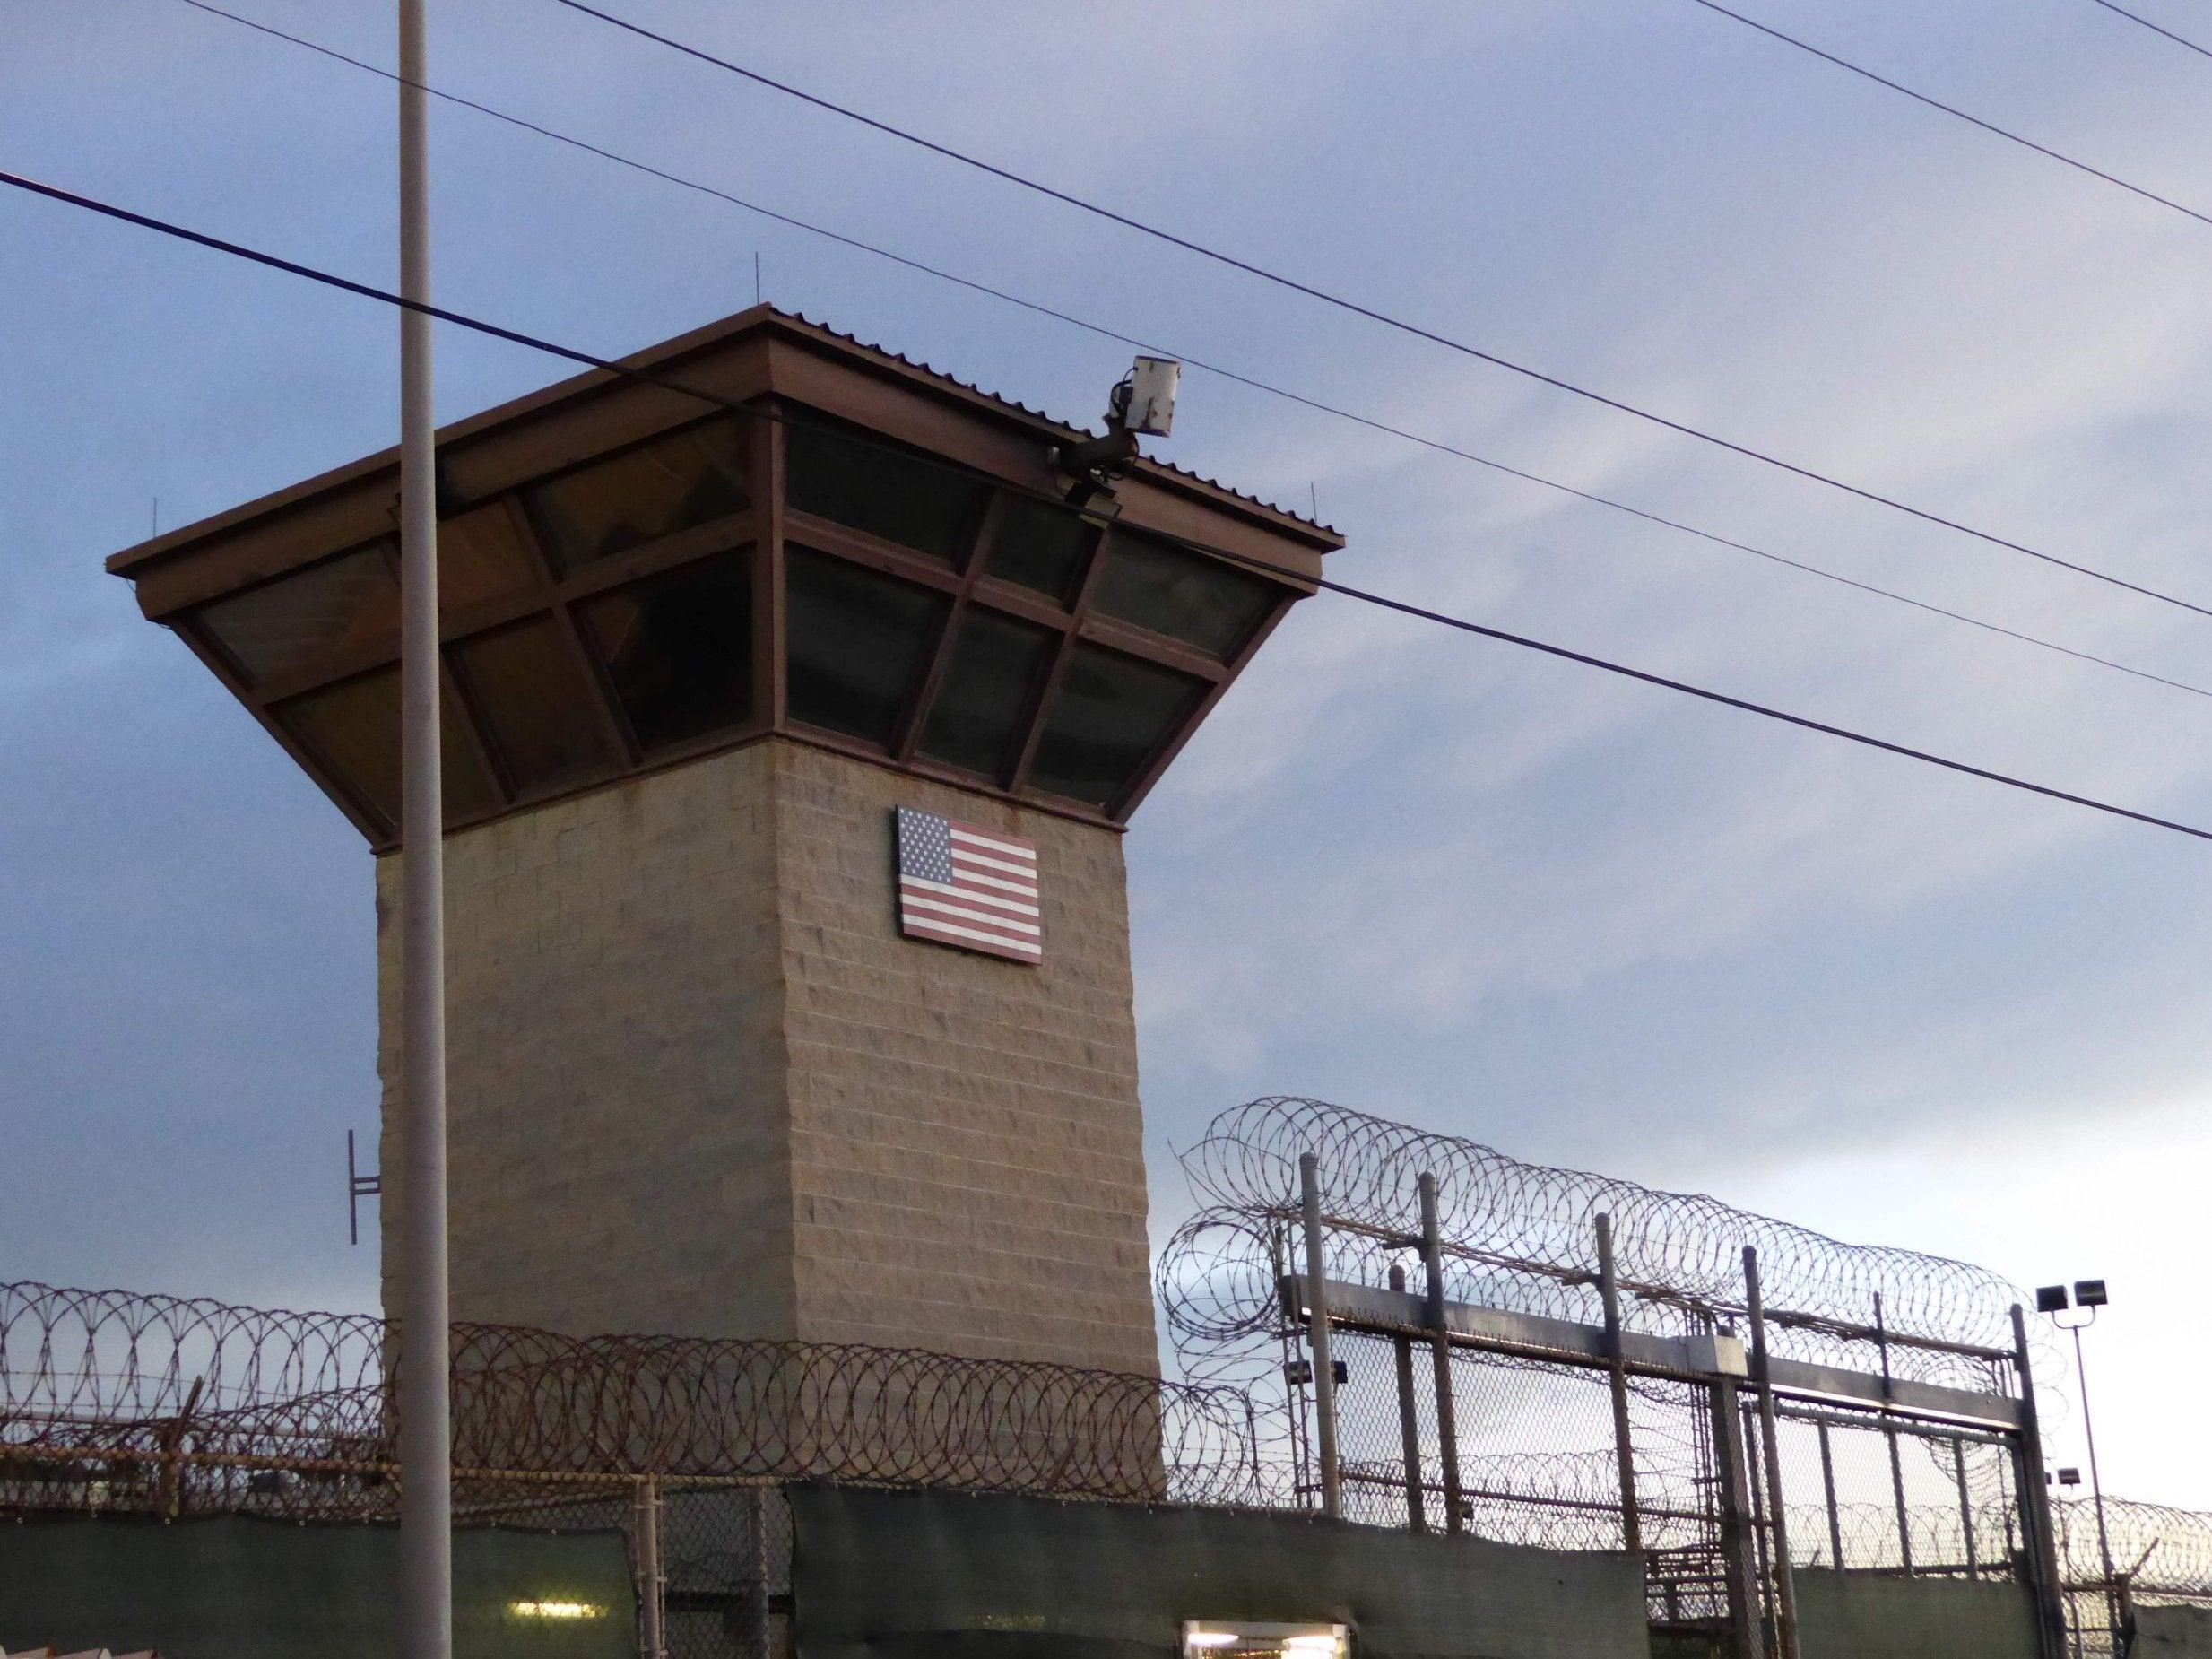 https://static.independent.co.uk/s3fs-public/thumbnails/image/2018/12/06/18/US-prison.jpg